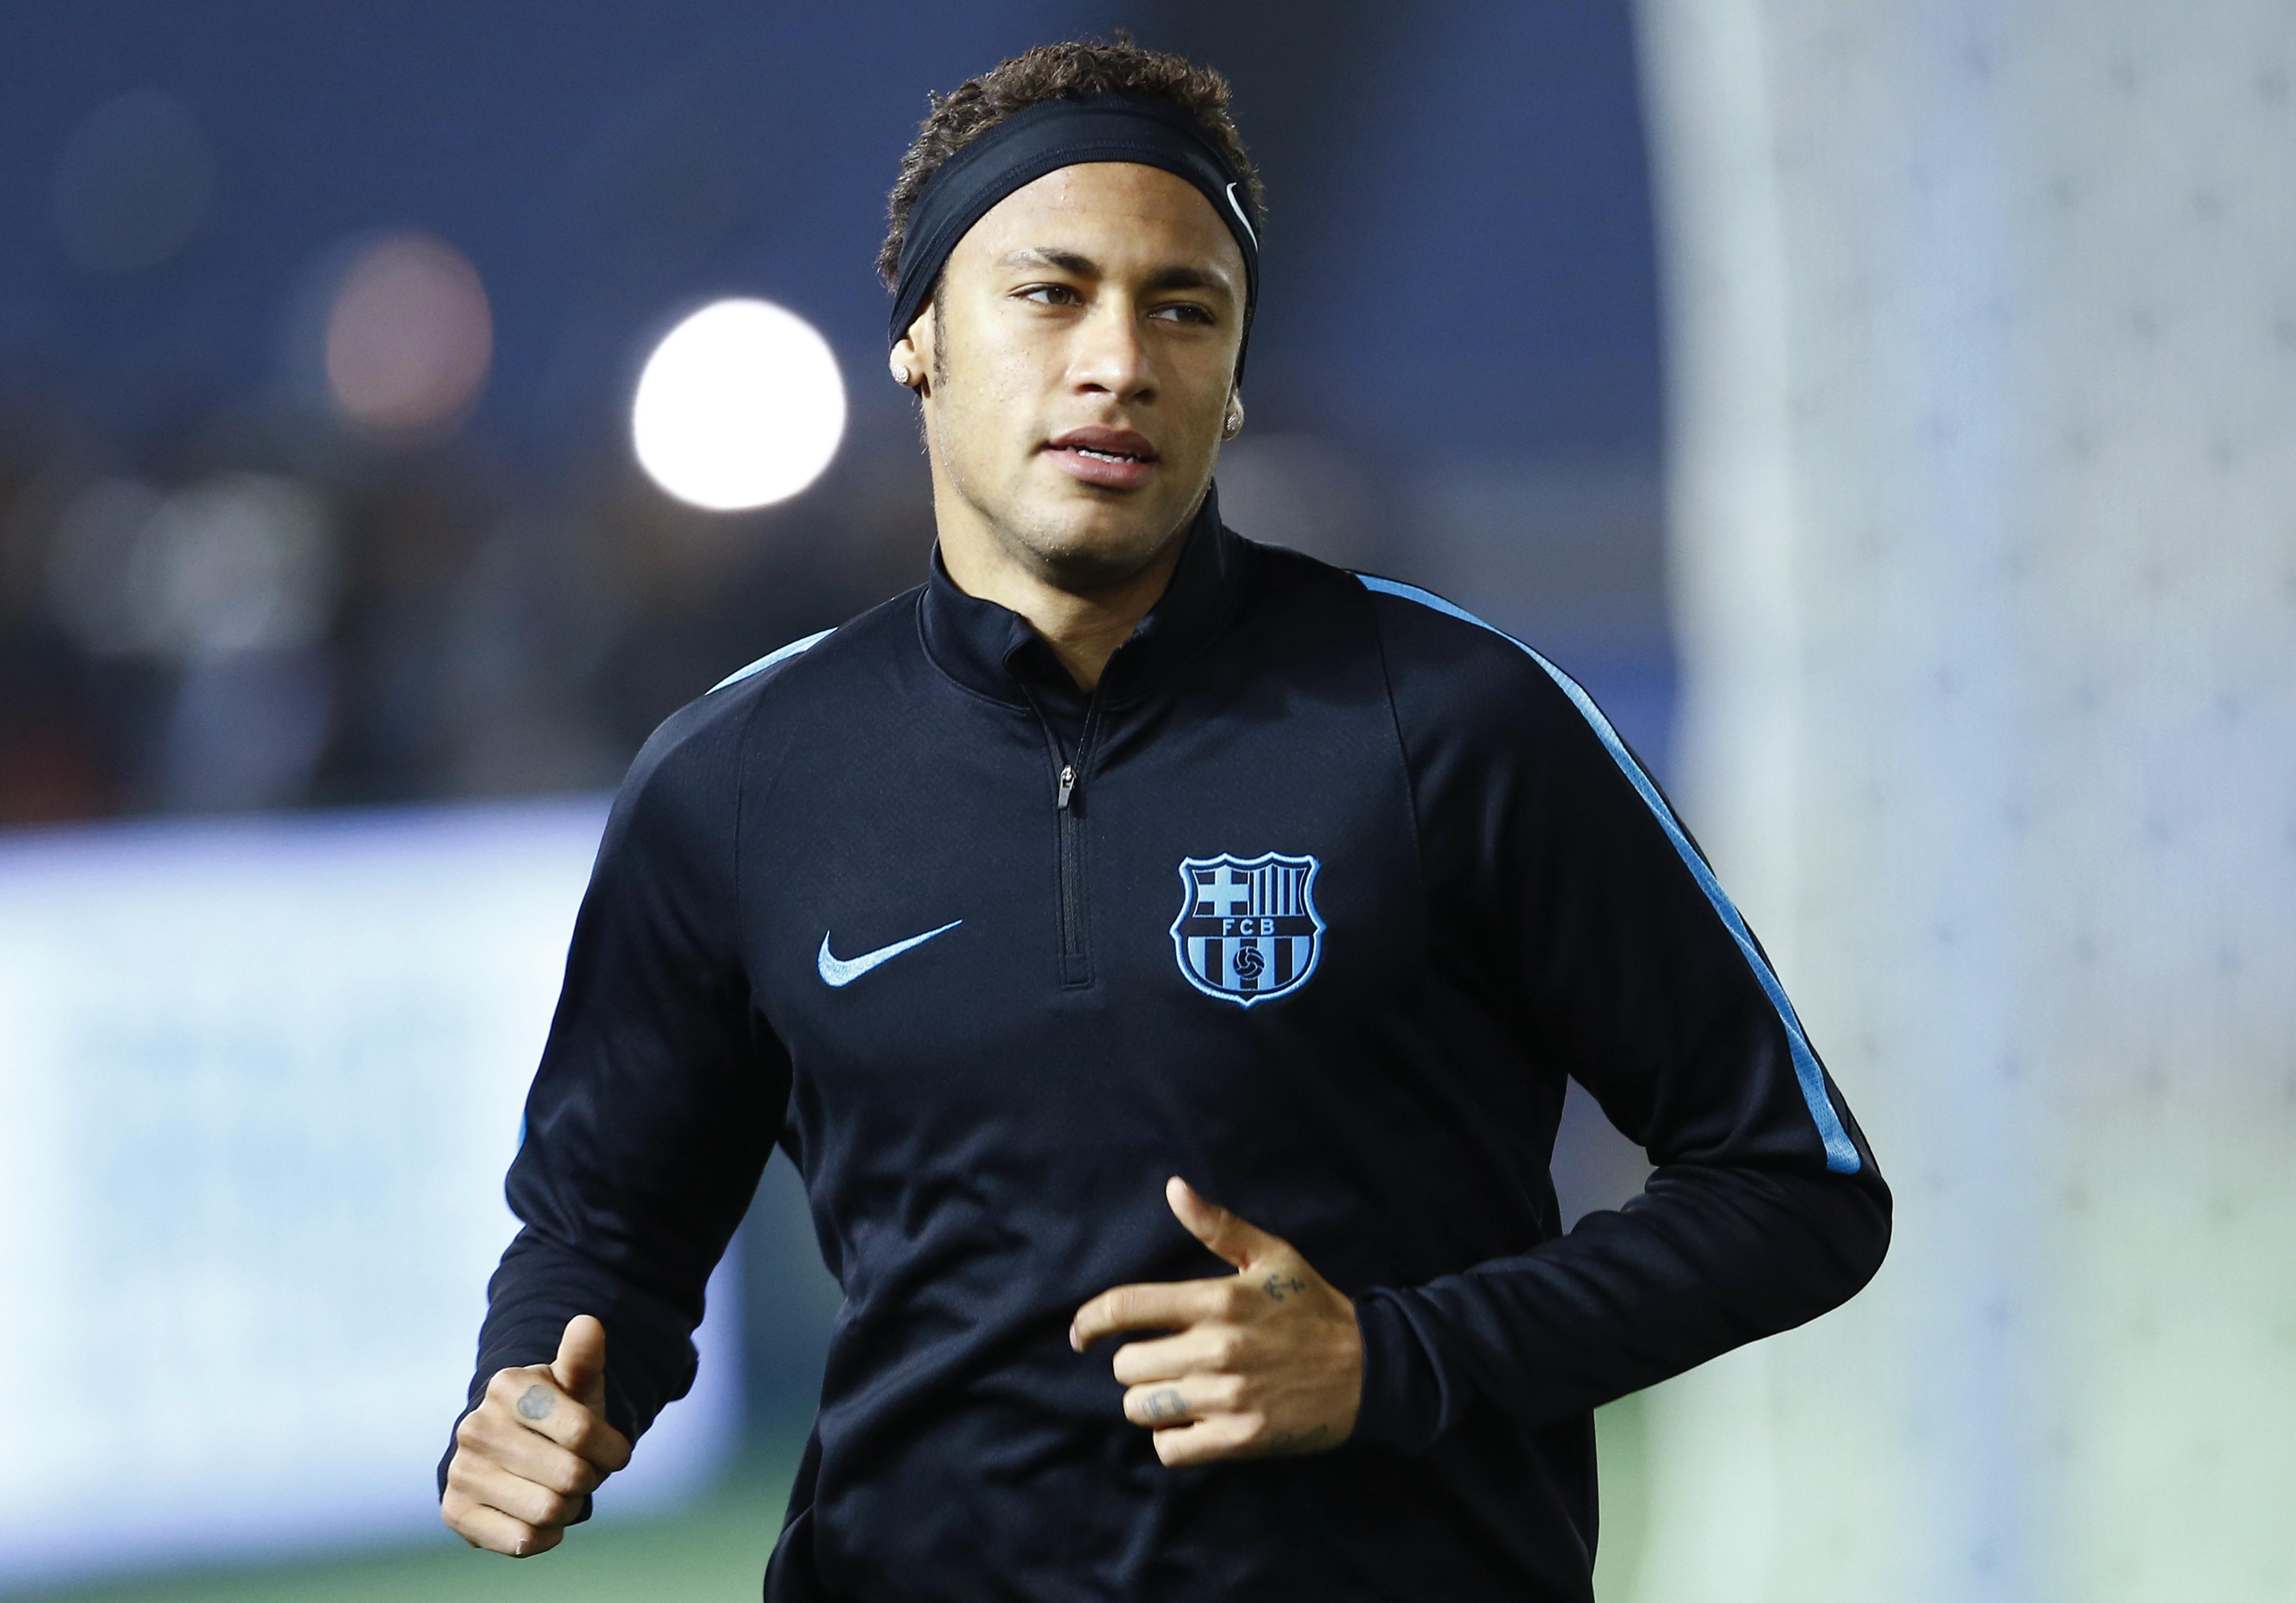 FC Barcelonau0092s Neymar runs during a practice session in Yokohama, near Tokyo, on Wednesday, December 16, 2015. Photo: AP